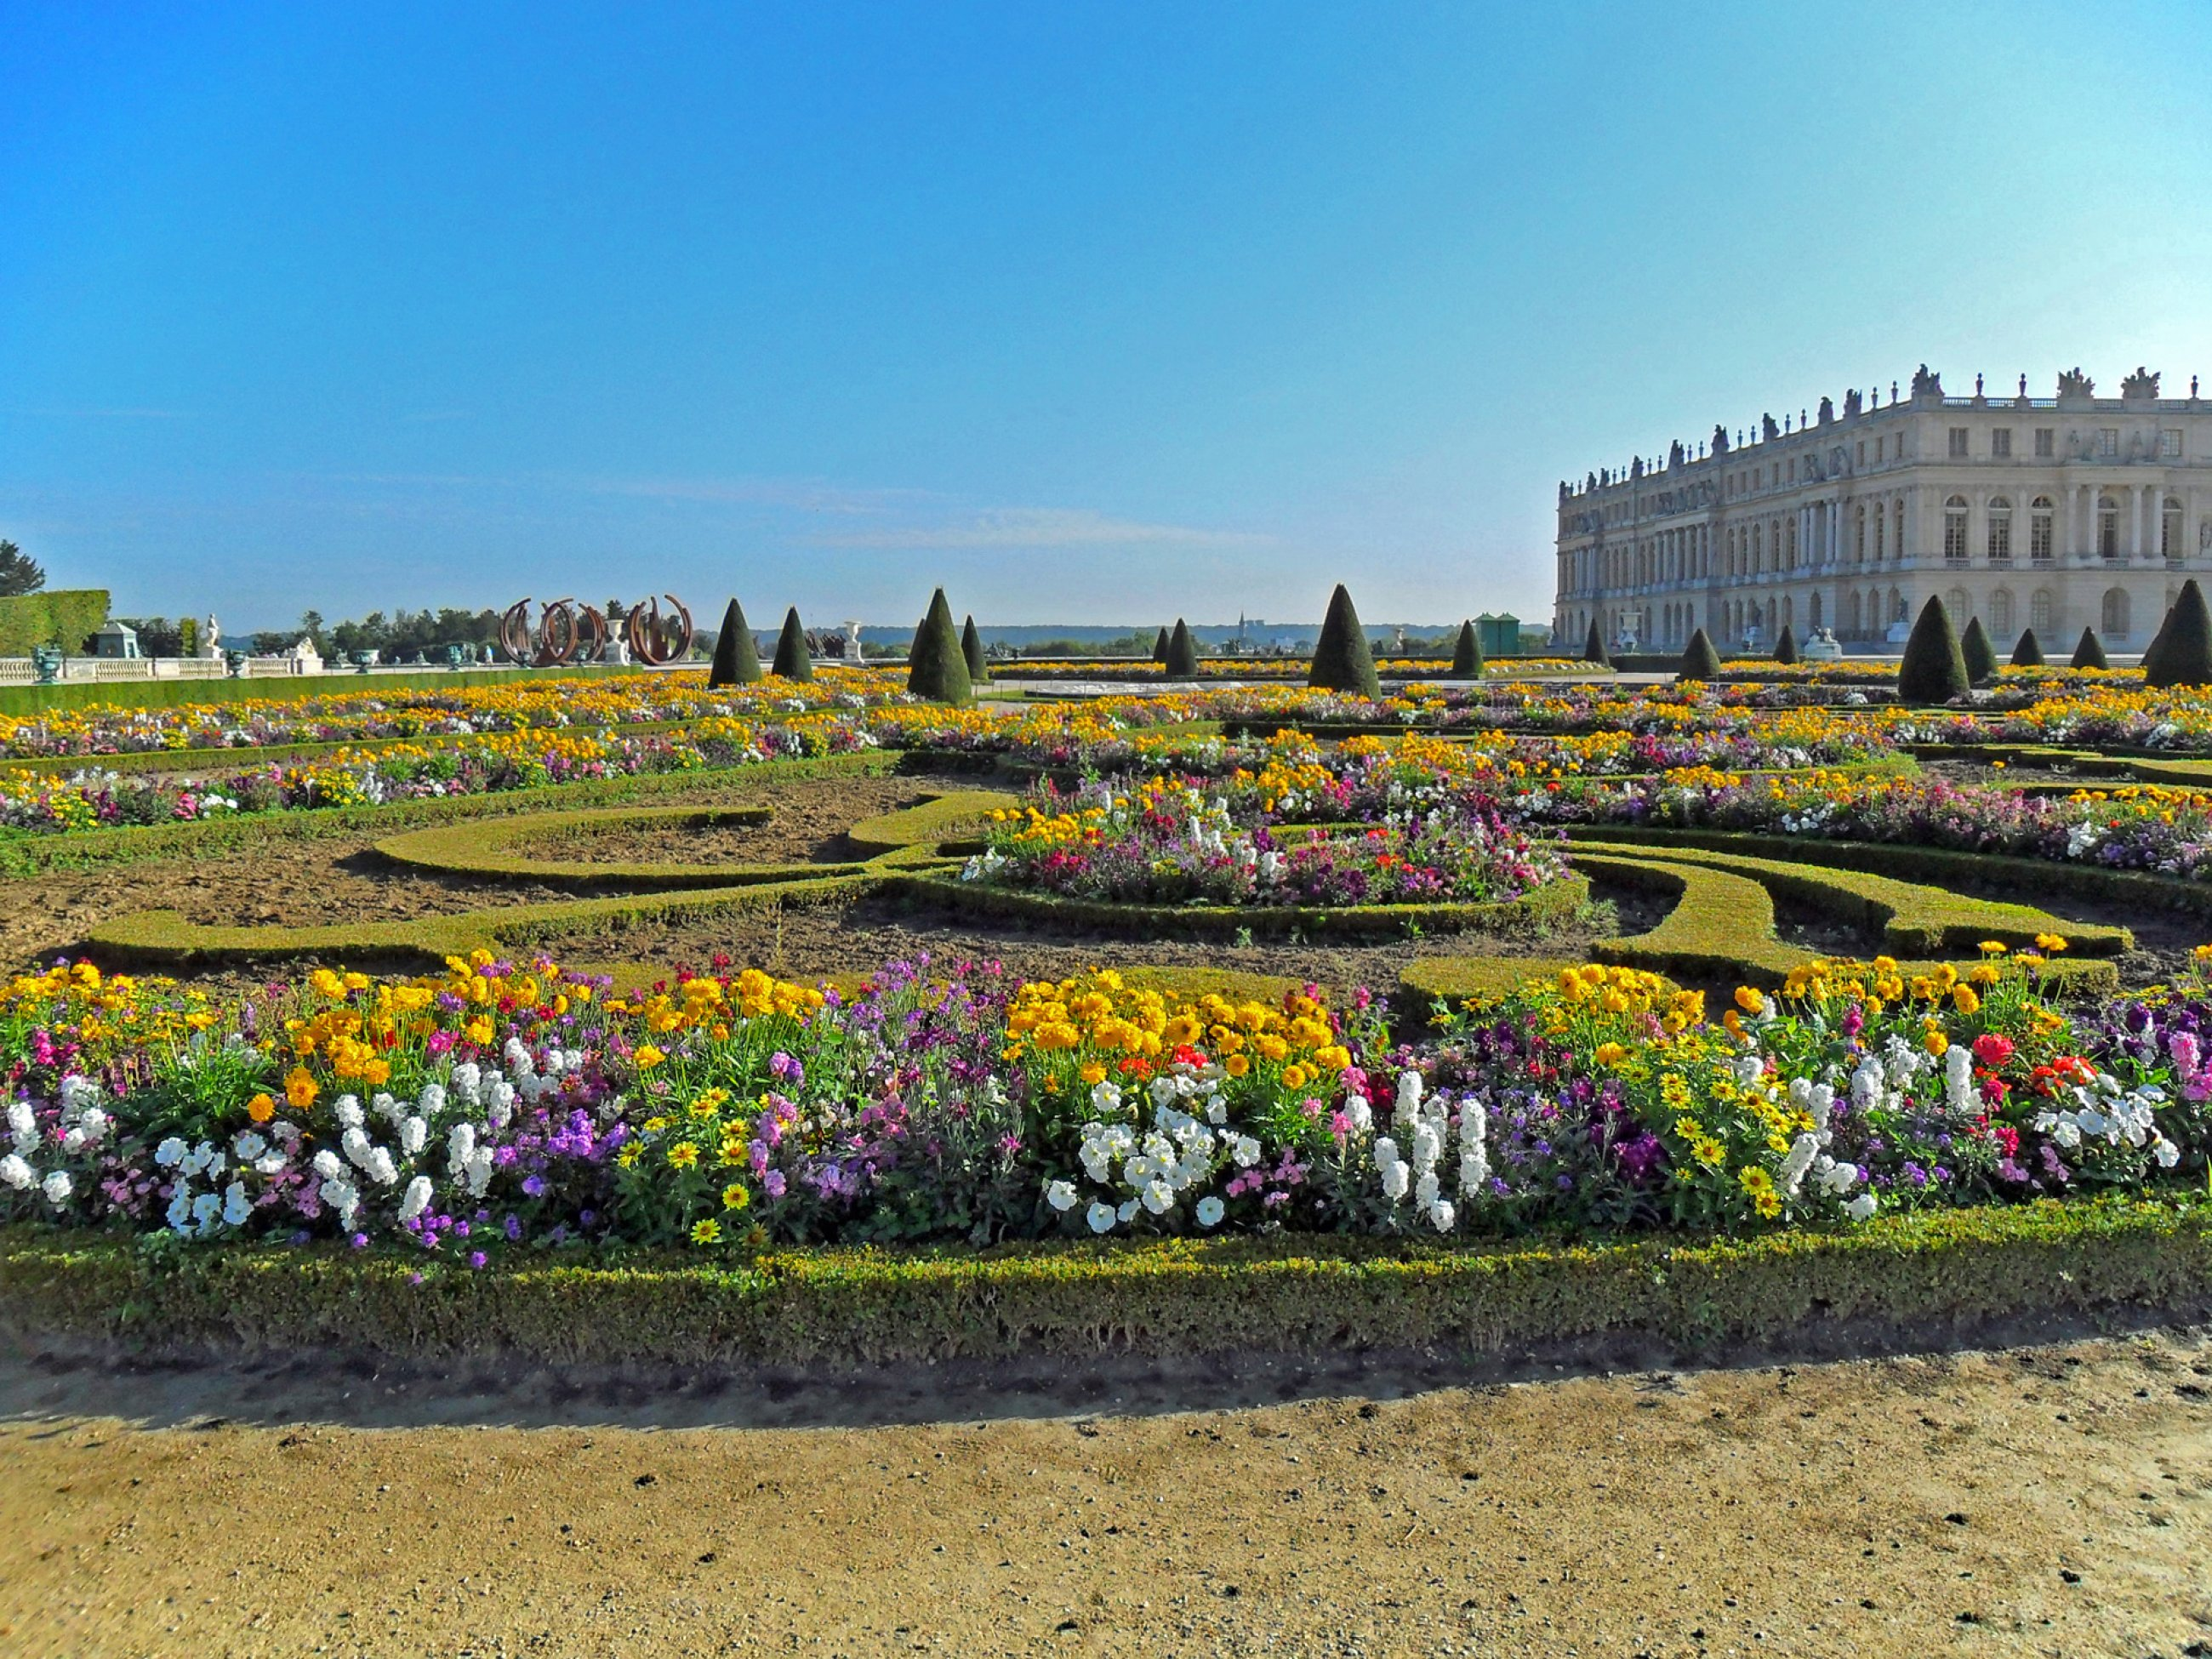 https://bubo.sk/uploads/galleries/7350/wikipedia-garden-facade-of-the-palace-of-versailles-3.jpg